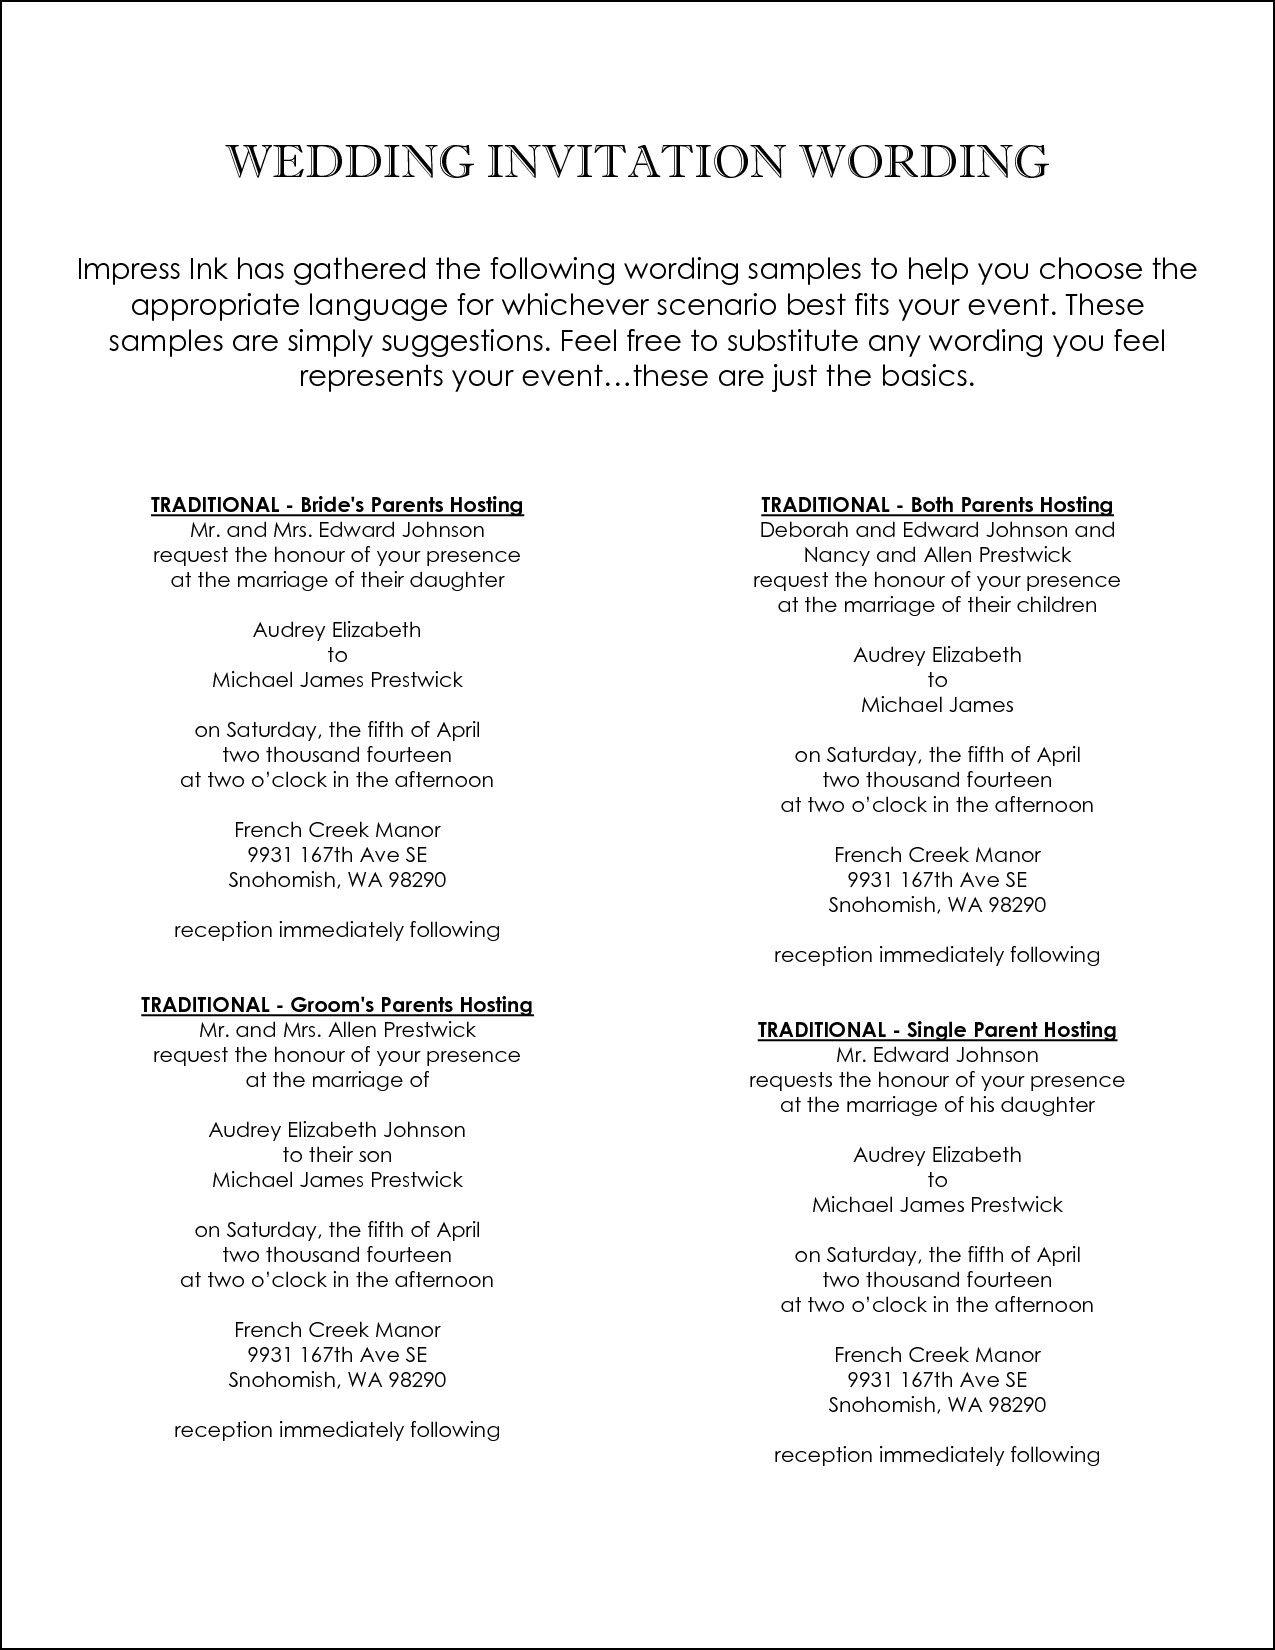 Couples Hosting Wedding Invitation Wording Unique